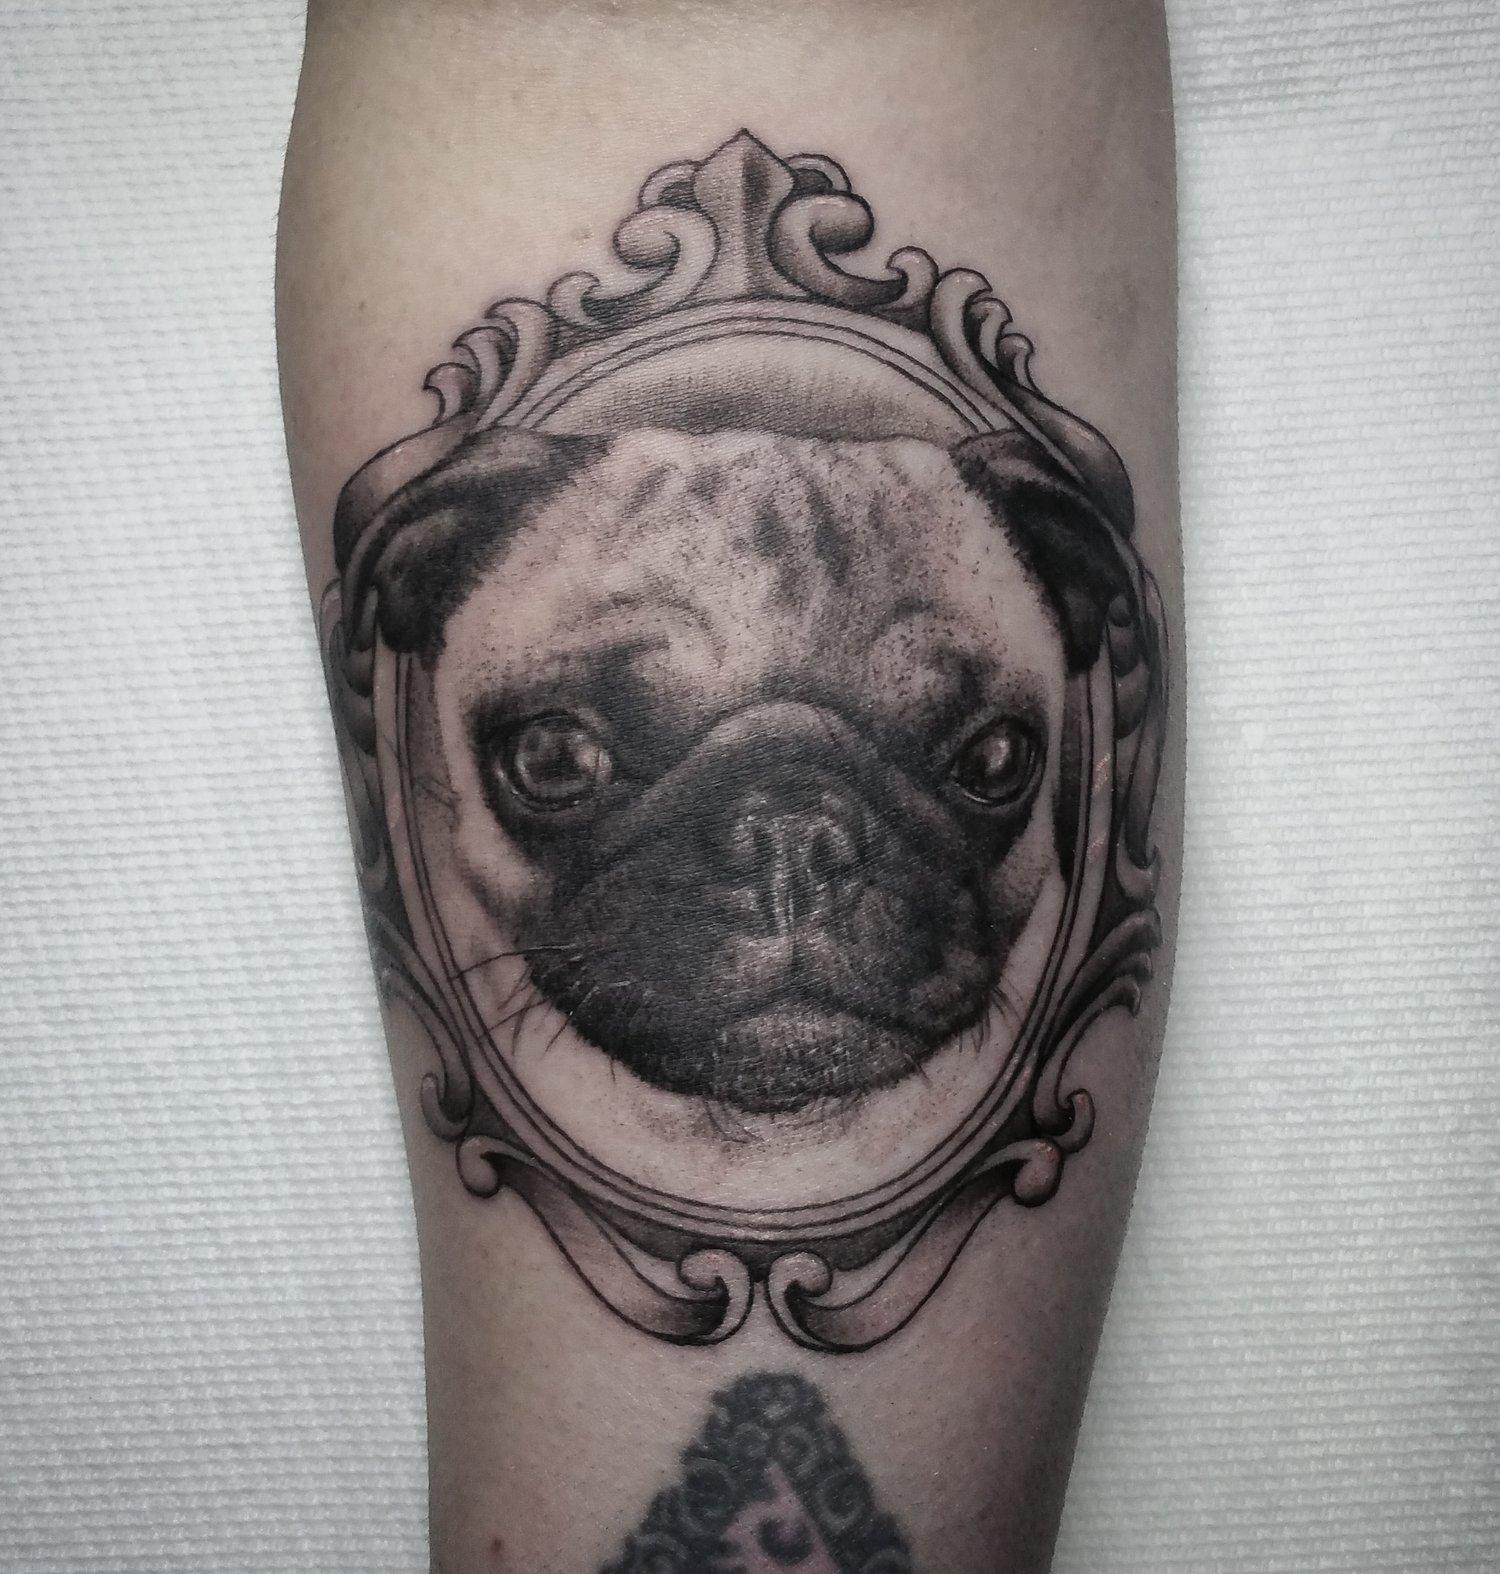 Familia-Tattoos-15.jpg